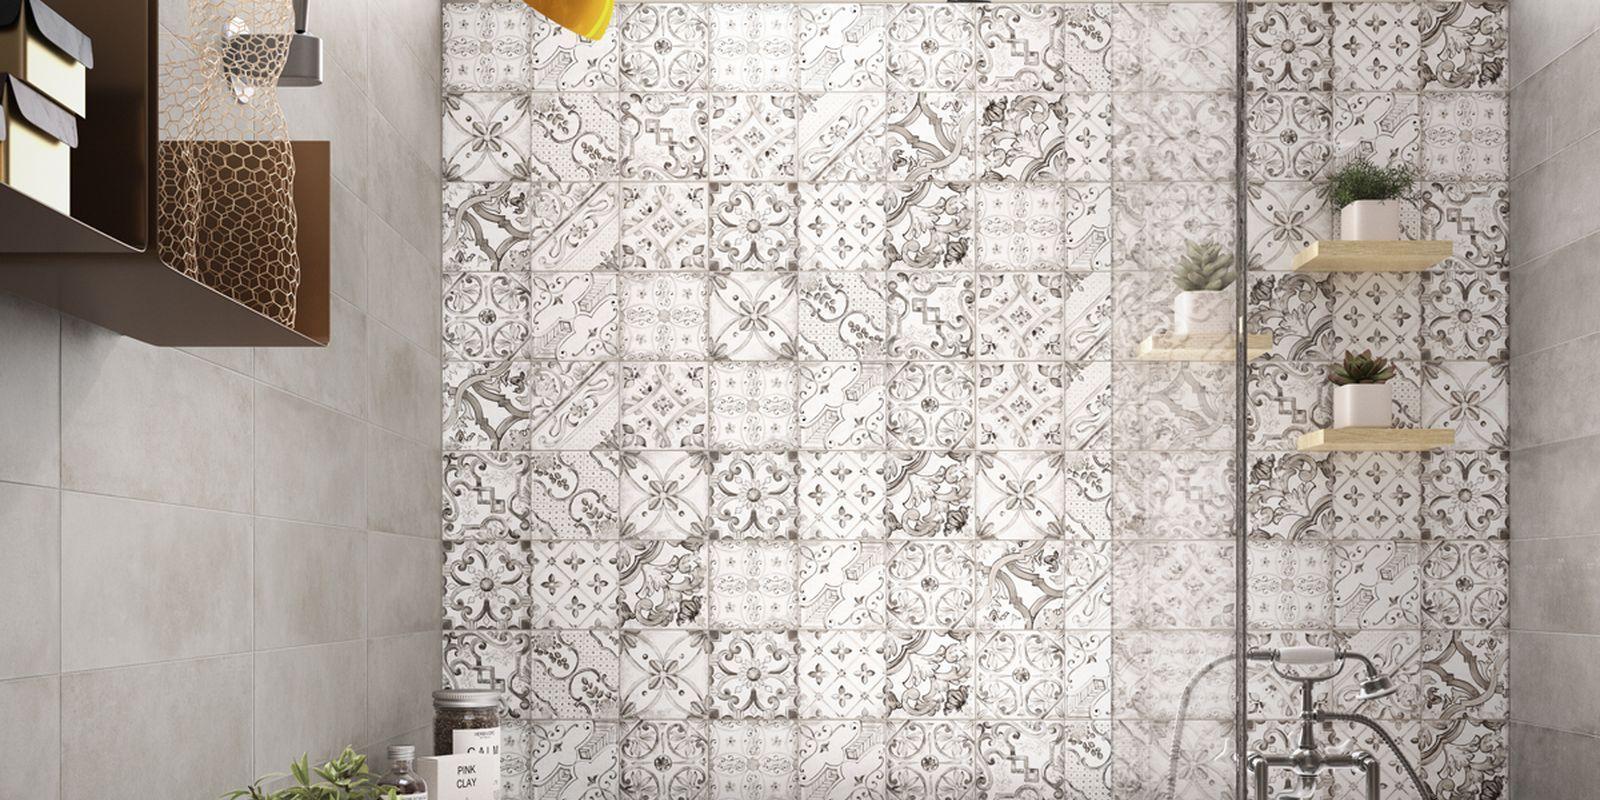 Imola - RIVERSIDE - Point p | Fliesen | Pinterest | Wall tiles ...